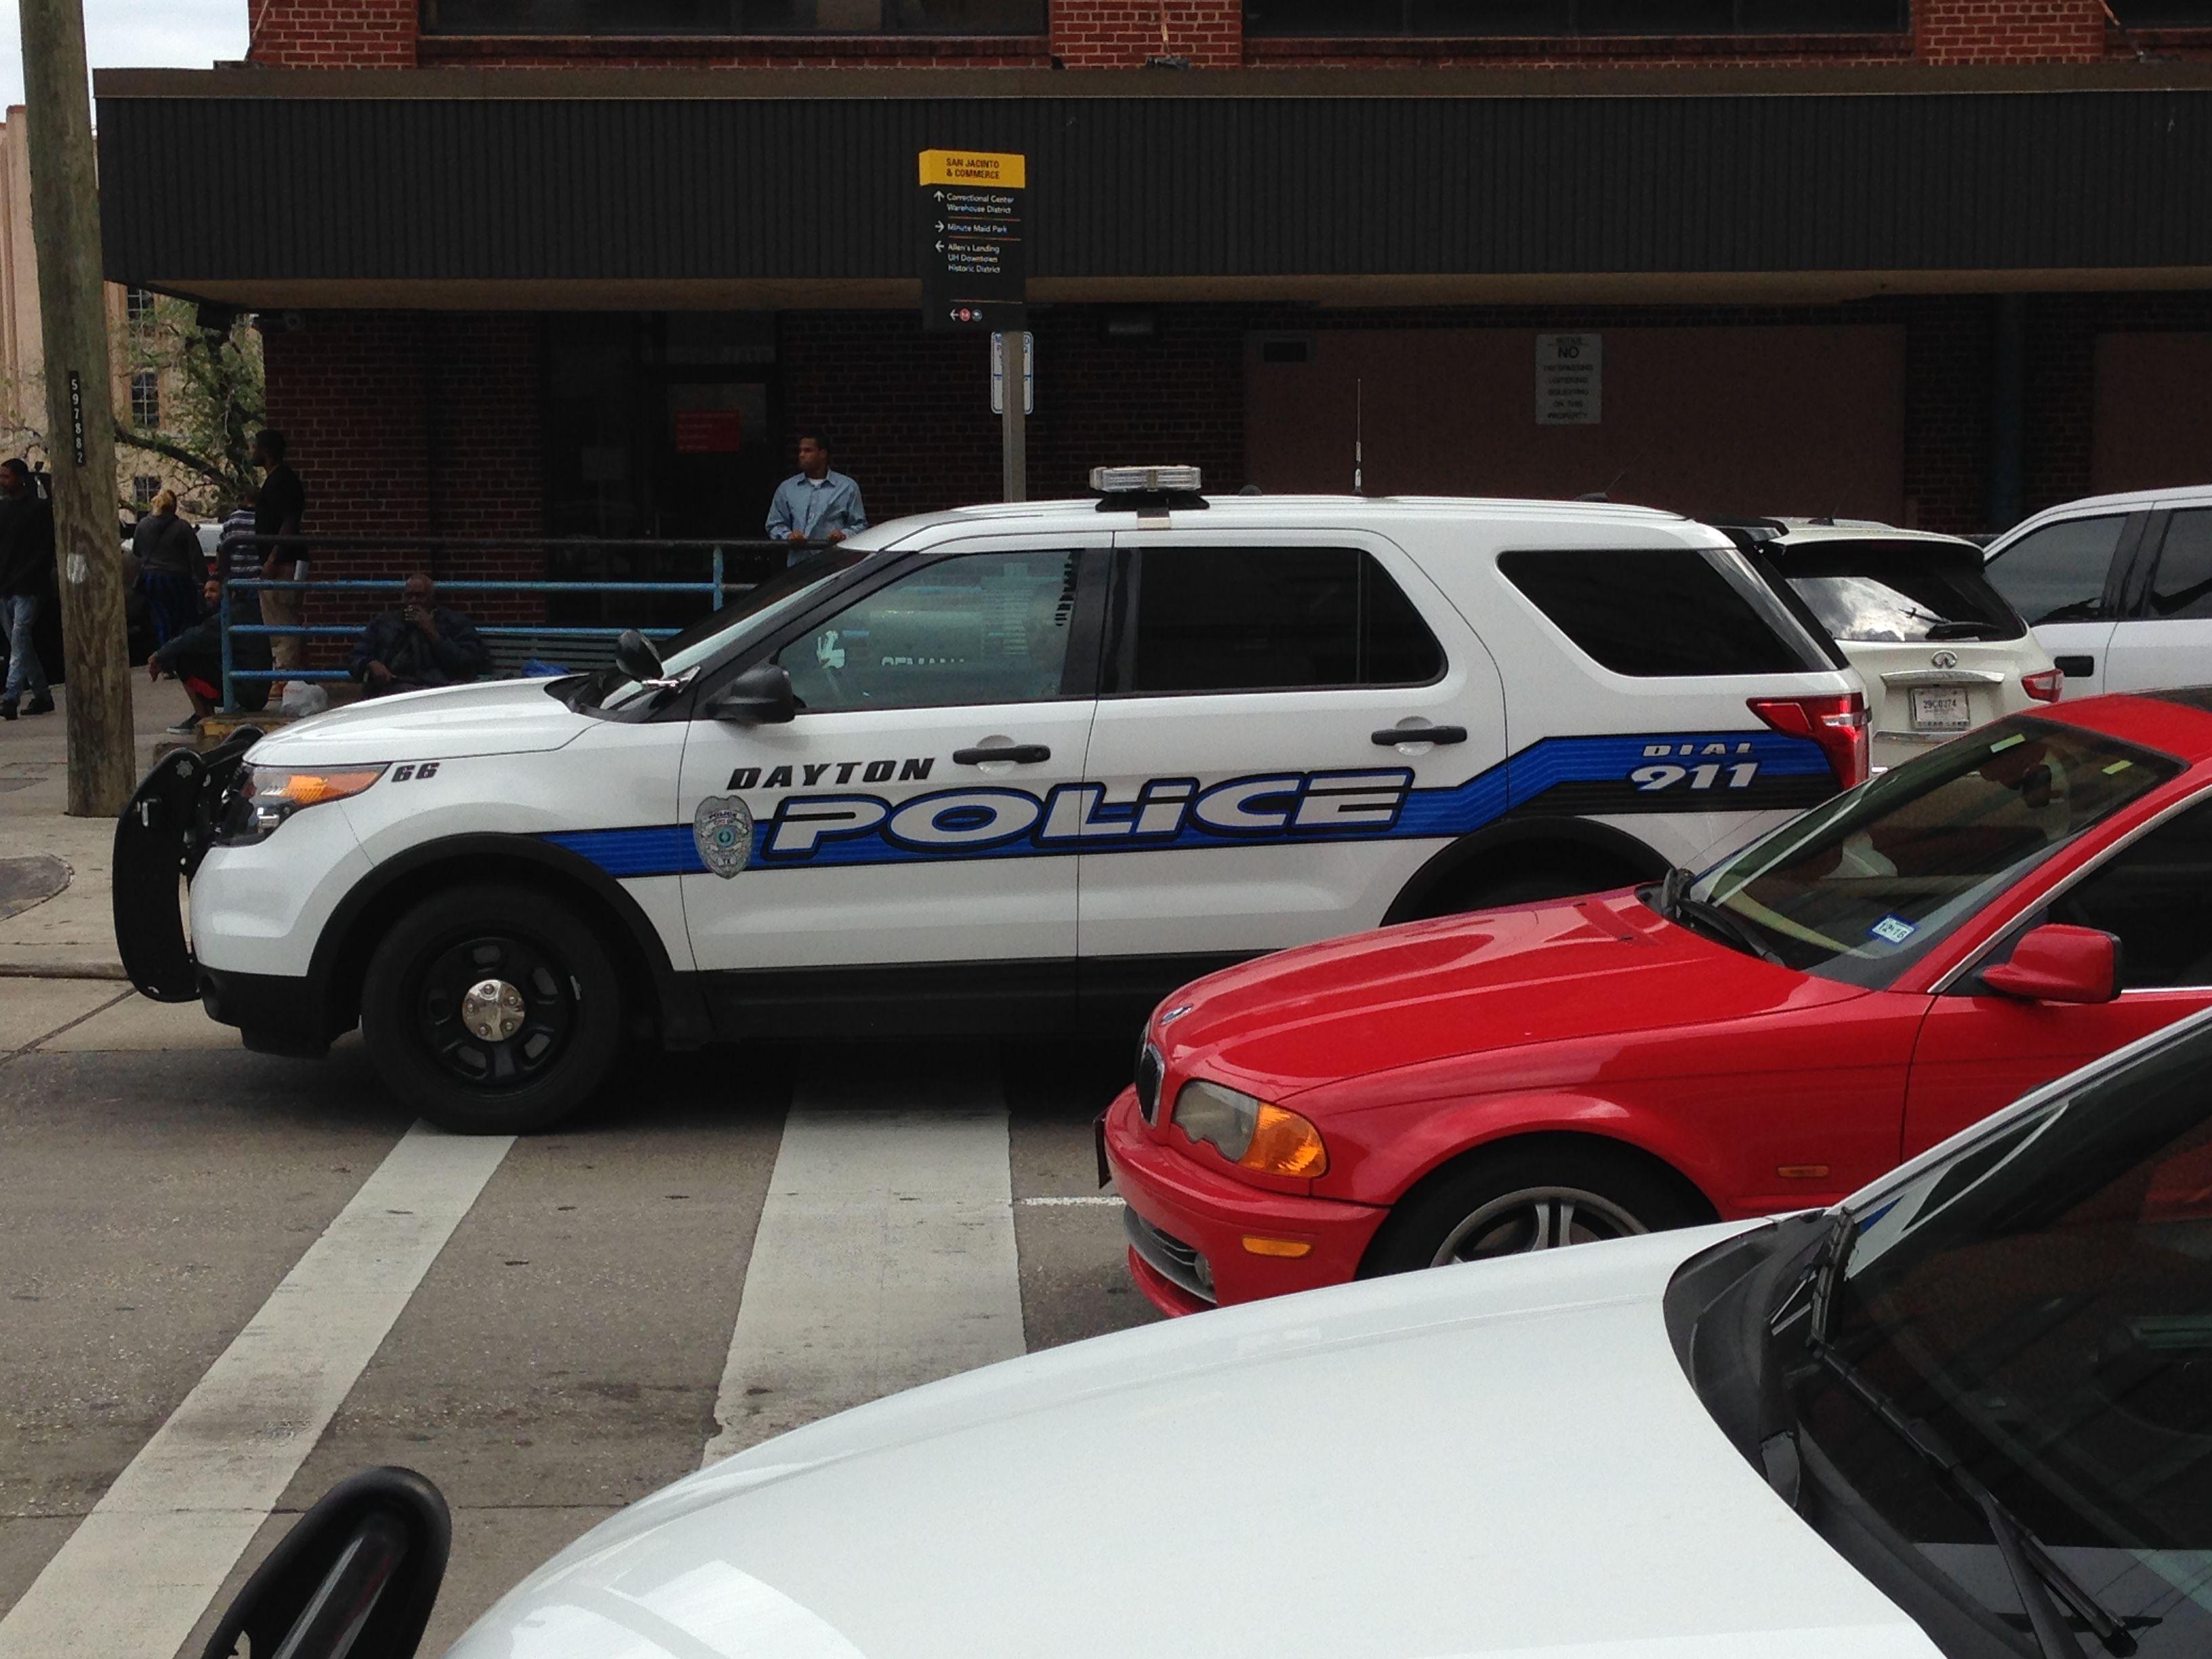 Dayton Police Dept Ford Pi Suv Texas Police Cars Emergency Vehicles Police Dept